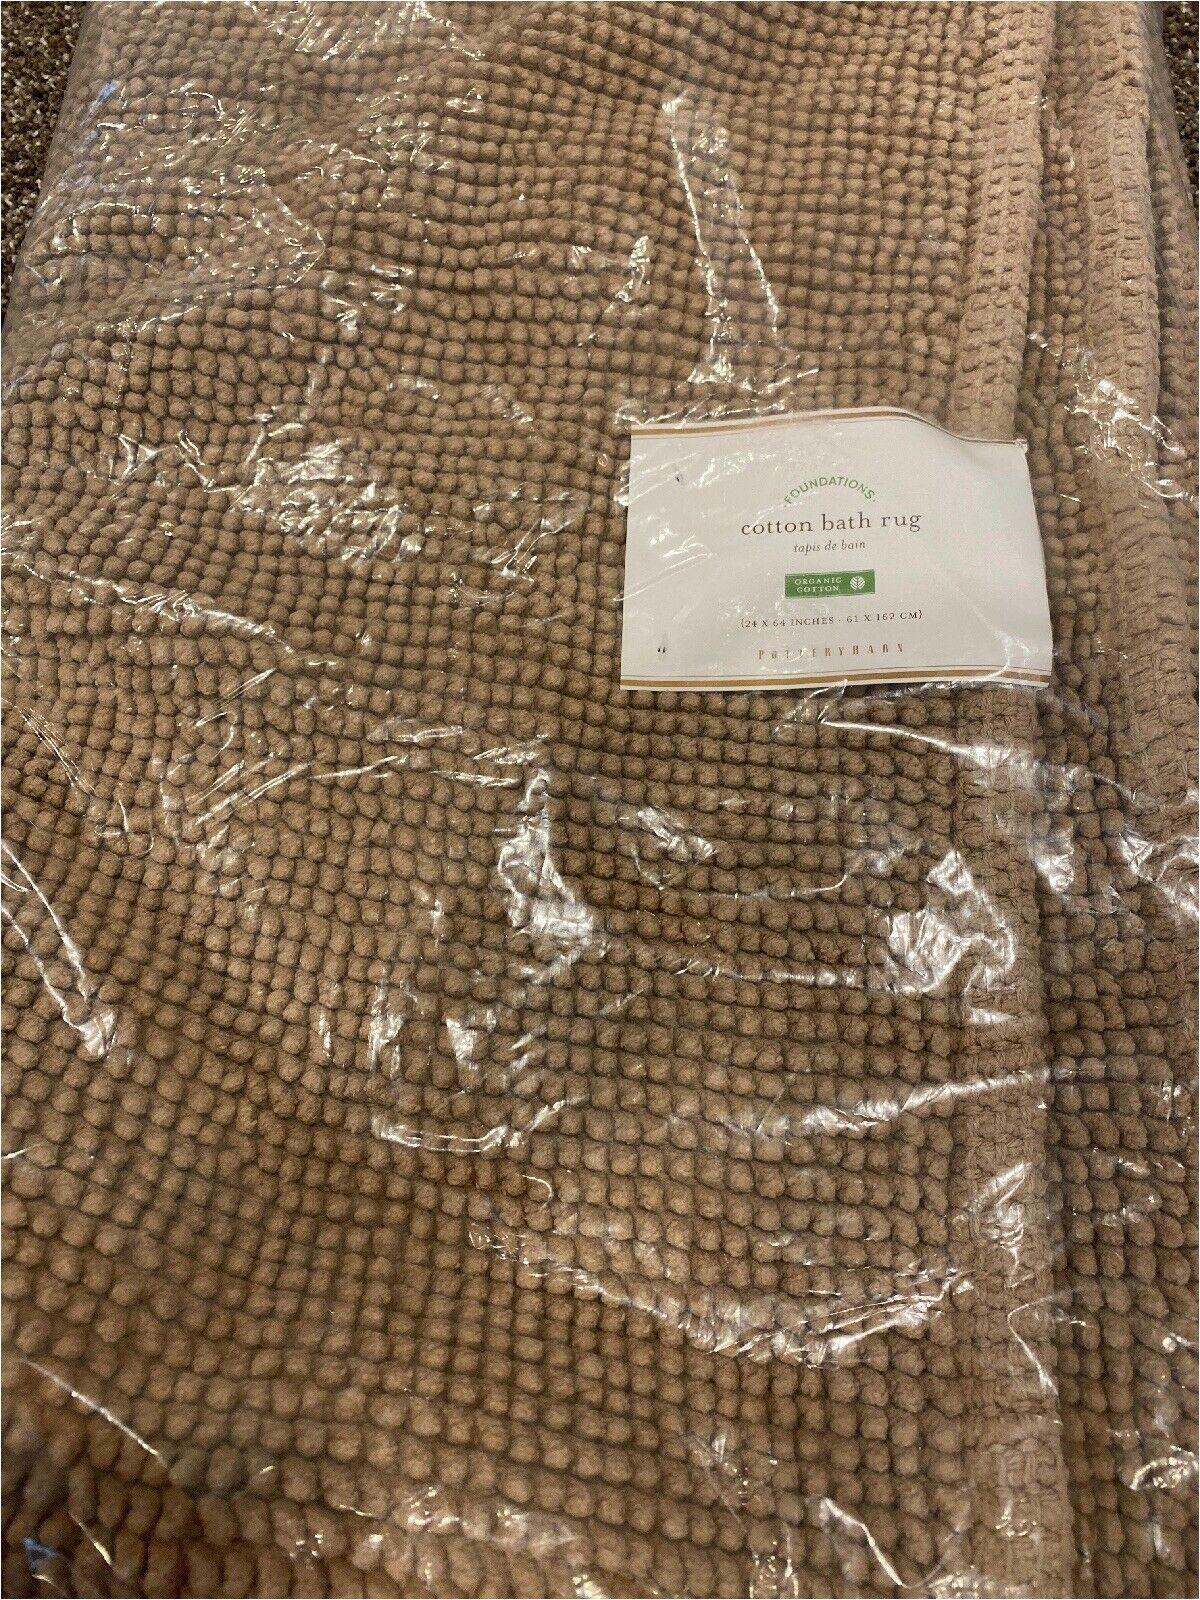 24 X 64 Bath Rug Pottery Barn Textured organic Cotton Bath Mat Rug Tan 24 X 64 Brand New